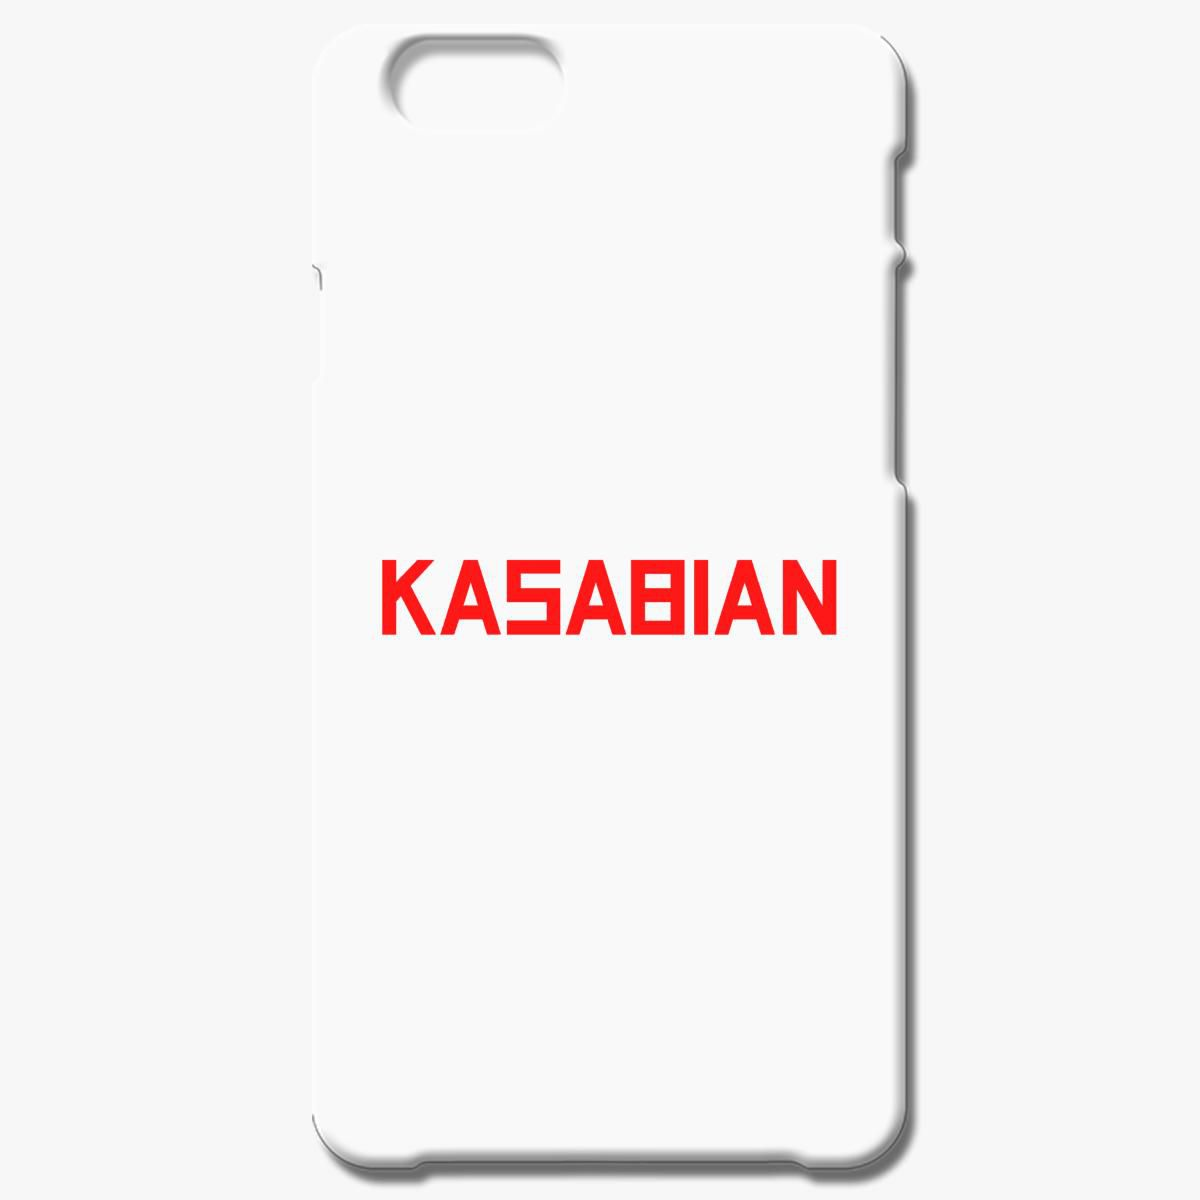 Kasabian Iphone 6 6s Case